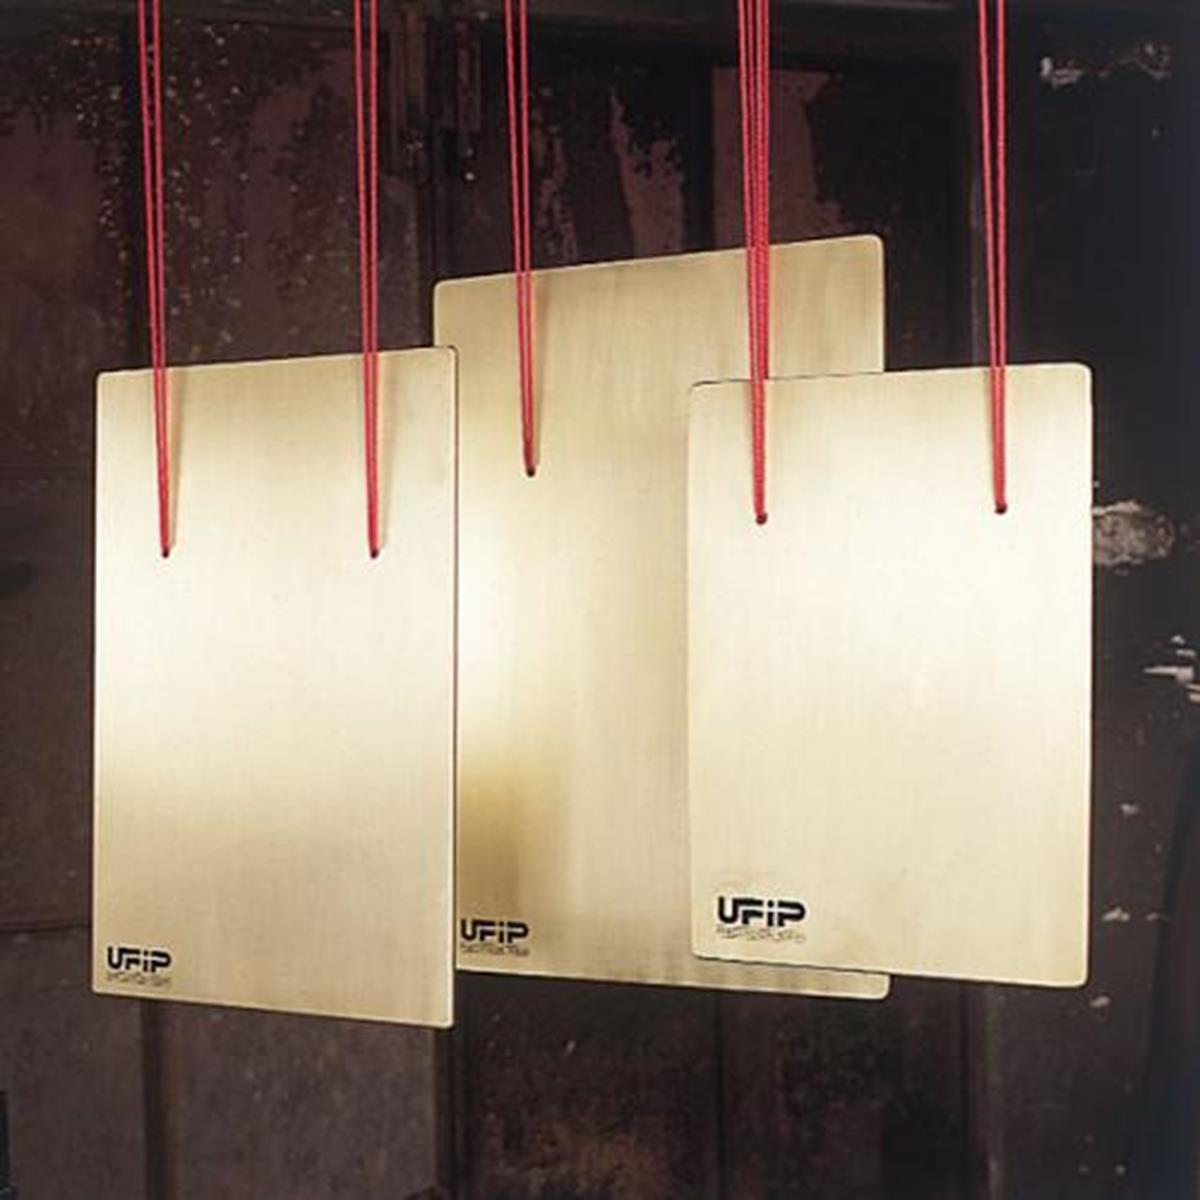 UFIP PEFLAT-ST - Stand per 1 ottava campane a lastra